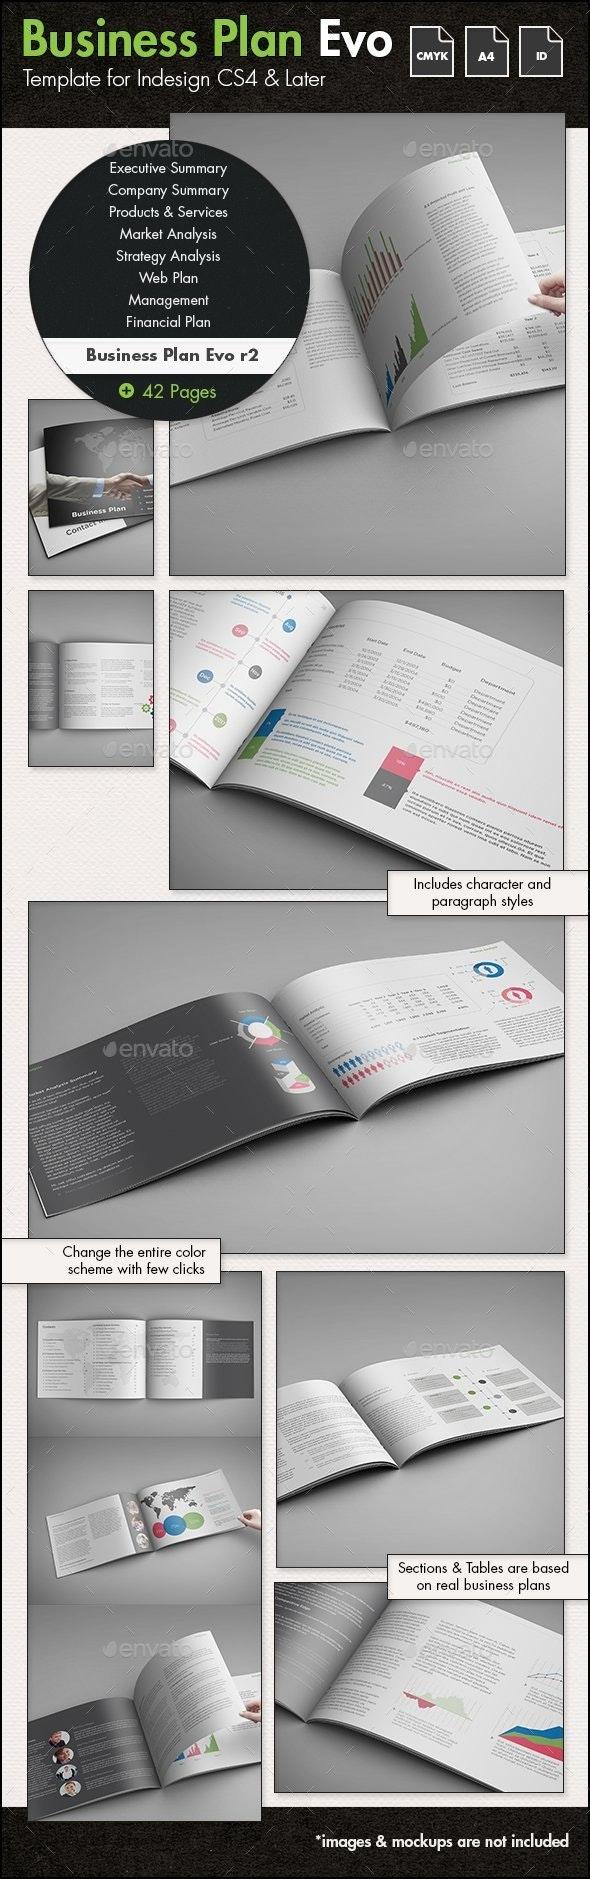 Business Plan Evolved r2 - A4 Landscape Template - Informational Brochures